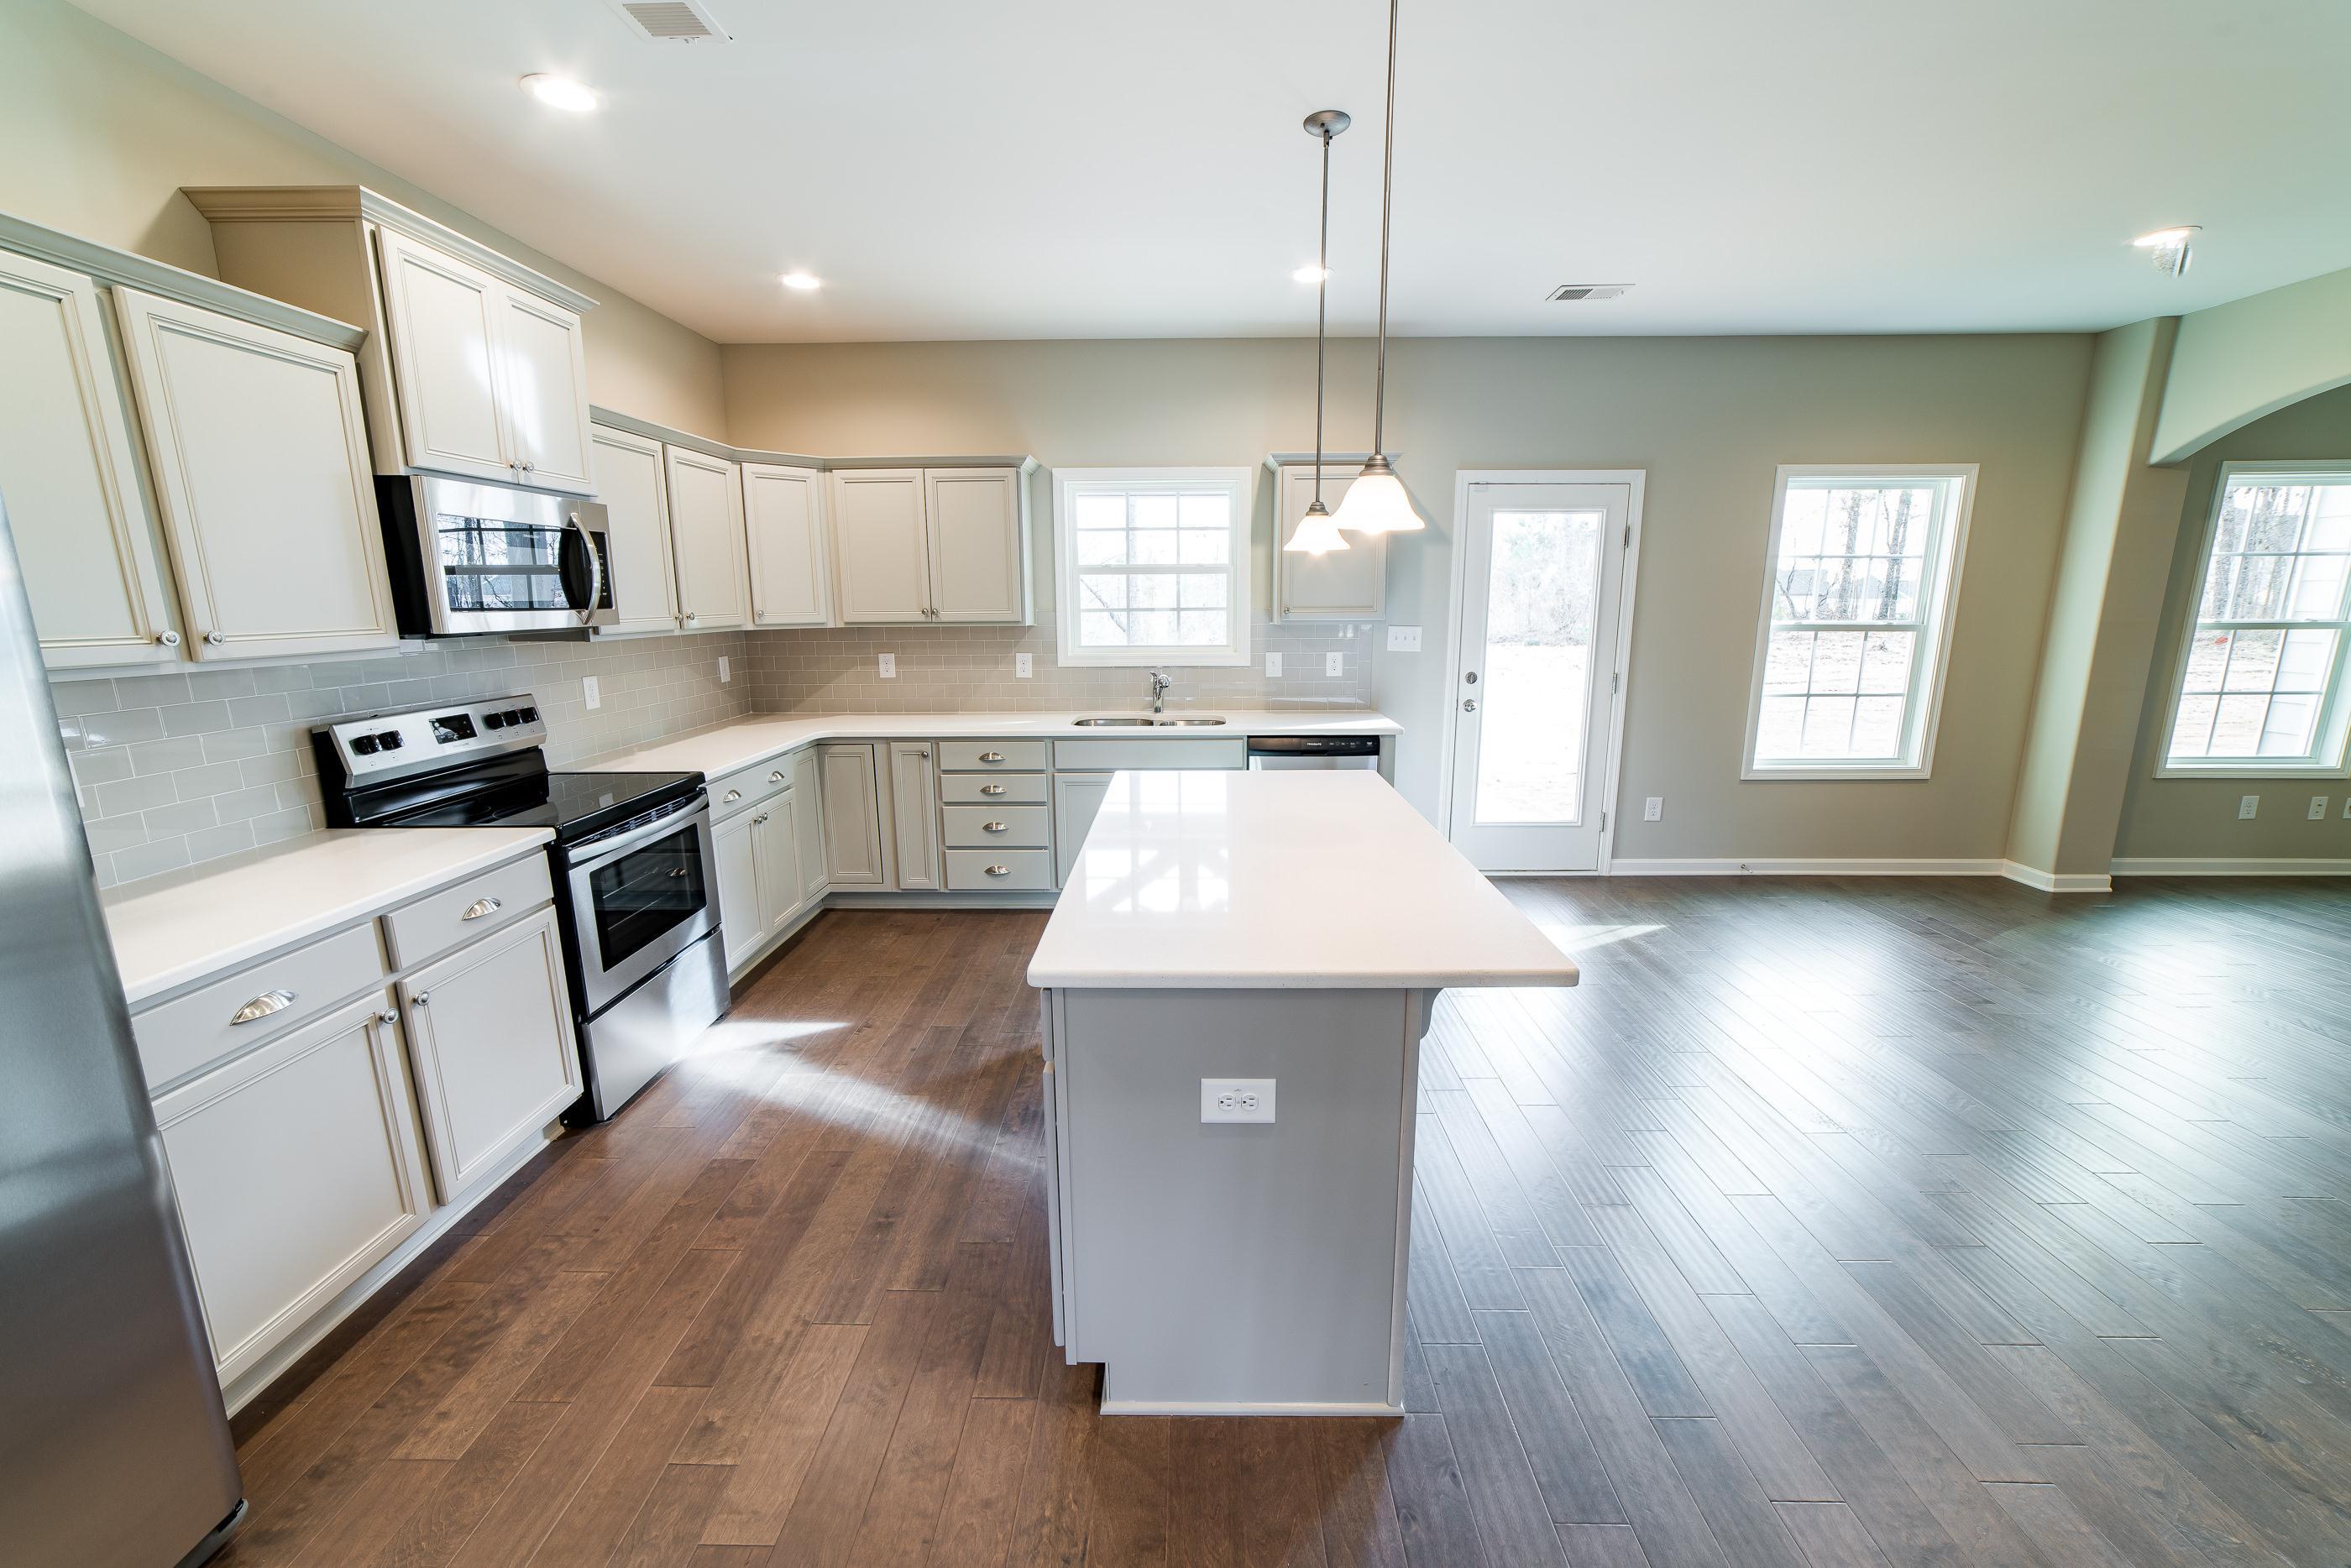 Kitchen featured in the Camden By Hughston Homes in Macon, GA